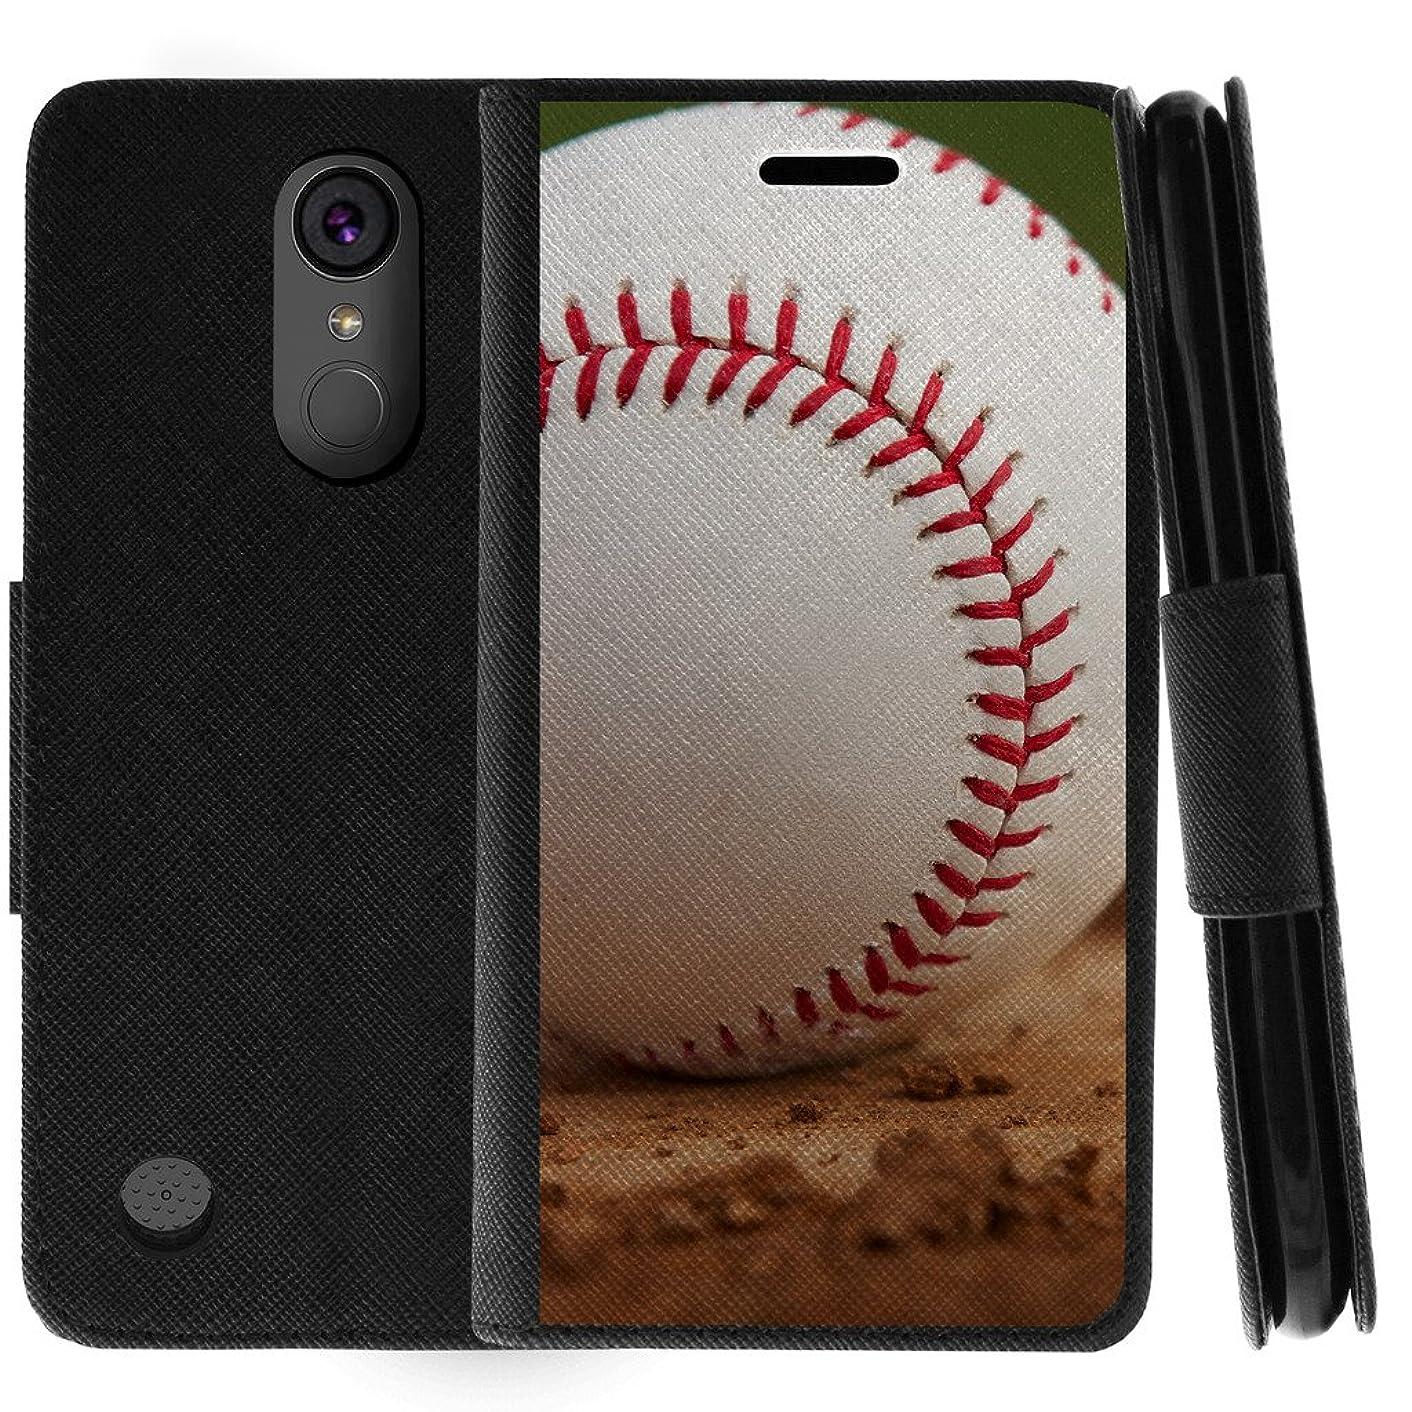 TurtleArmor | Compatible for LG K20 V Case | K20 Plus Case | K10 2017 Case | Flip Kickstand Wallet Case Cover with Card Slots Sports and Games Design - Baseball Dirt